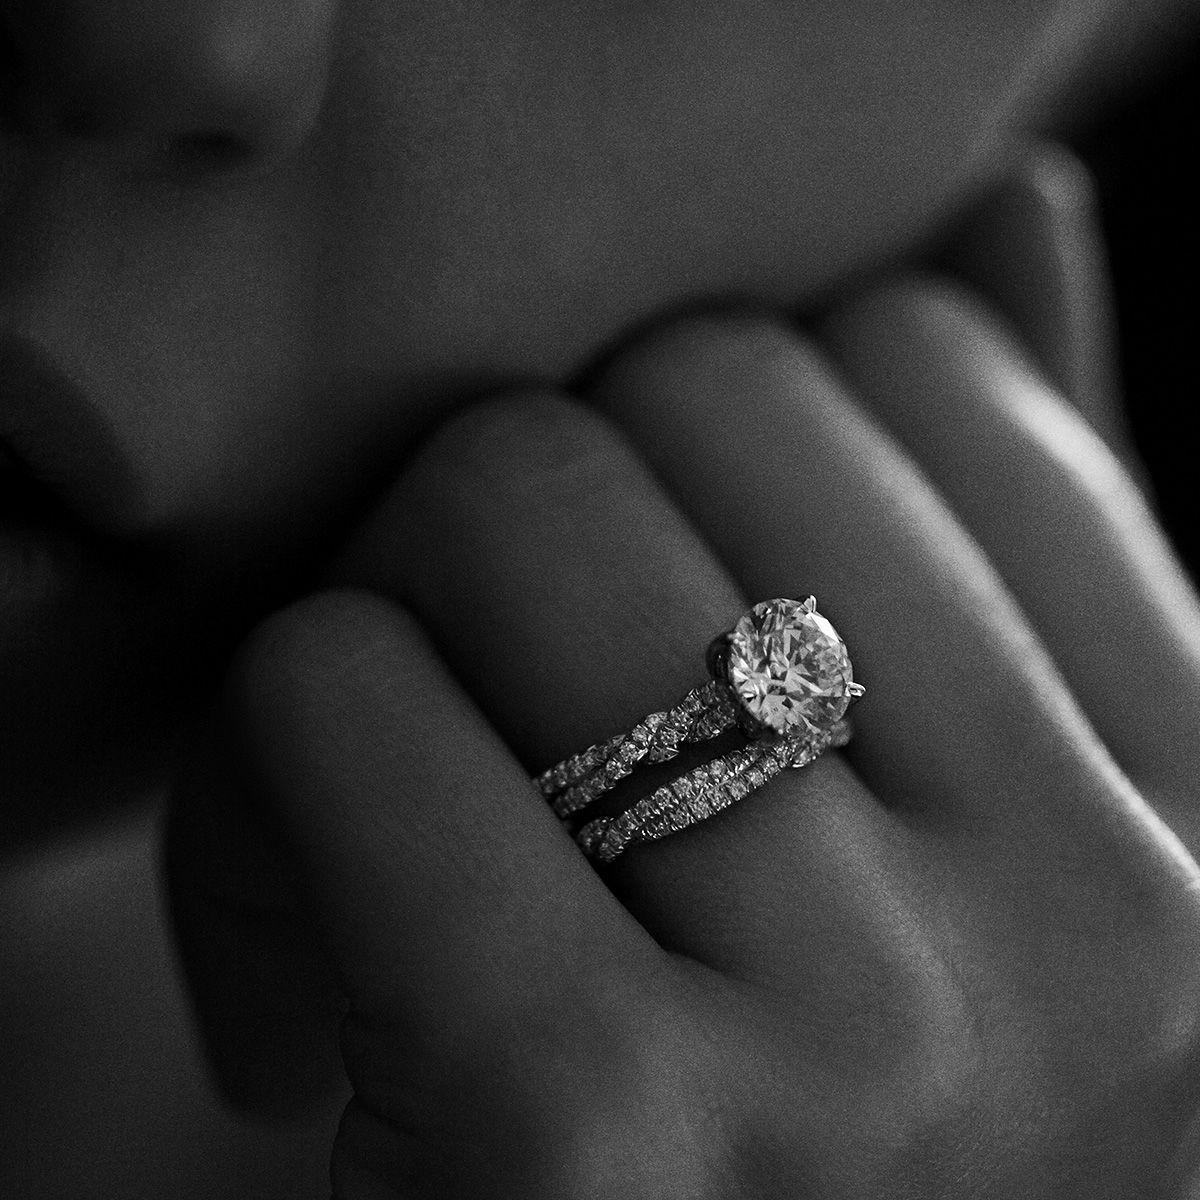 david yurman wedding rings Unique details distinguish a David Yurman engagement ring from the rest